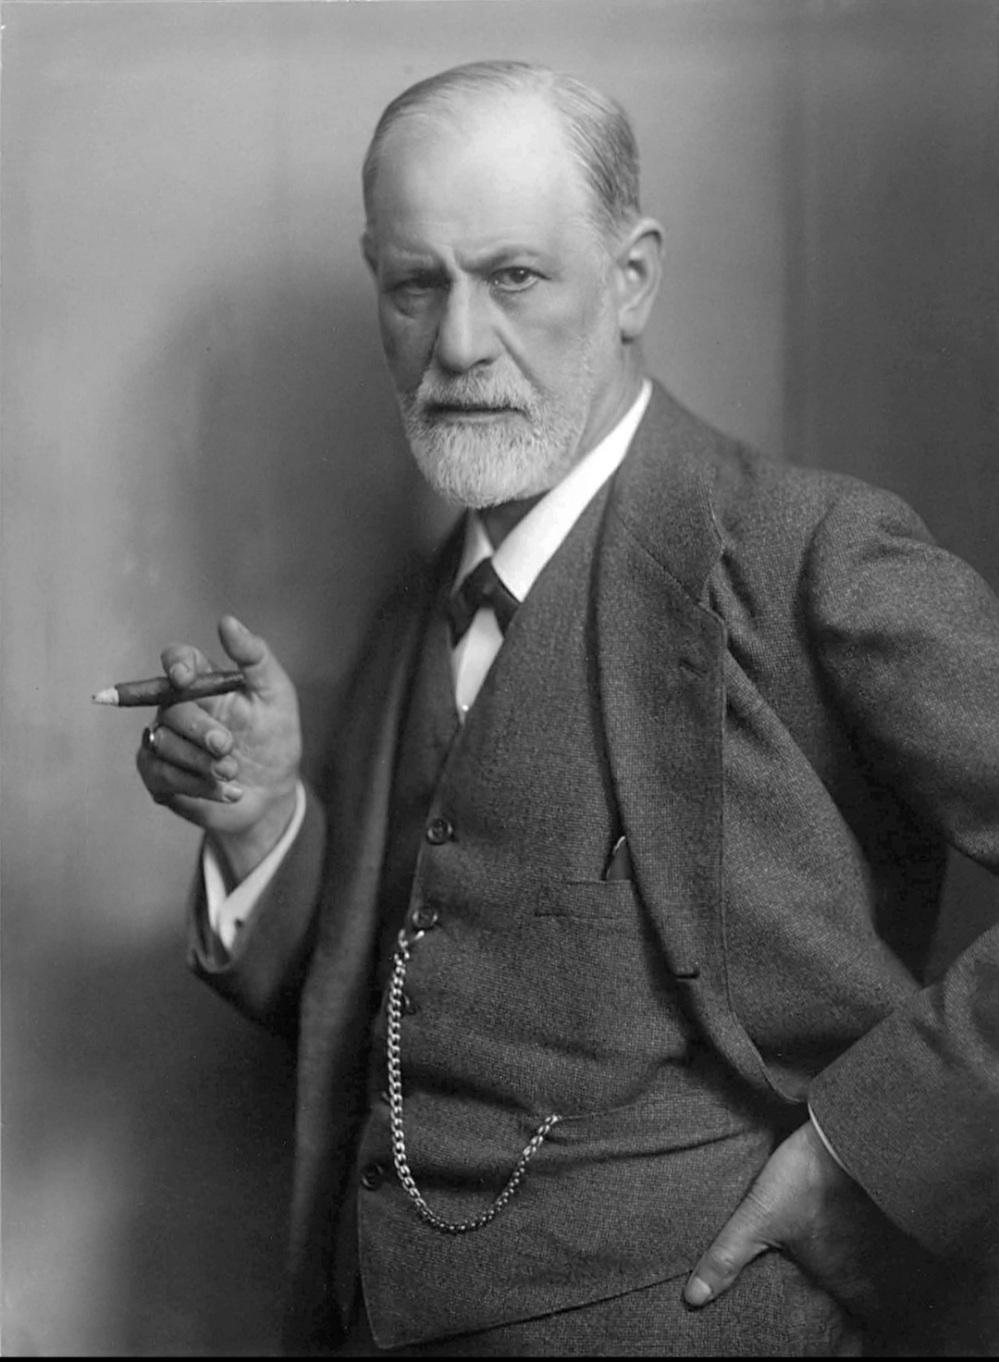 Sigmund Freud black and white photograph potrait